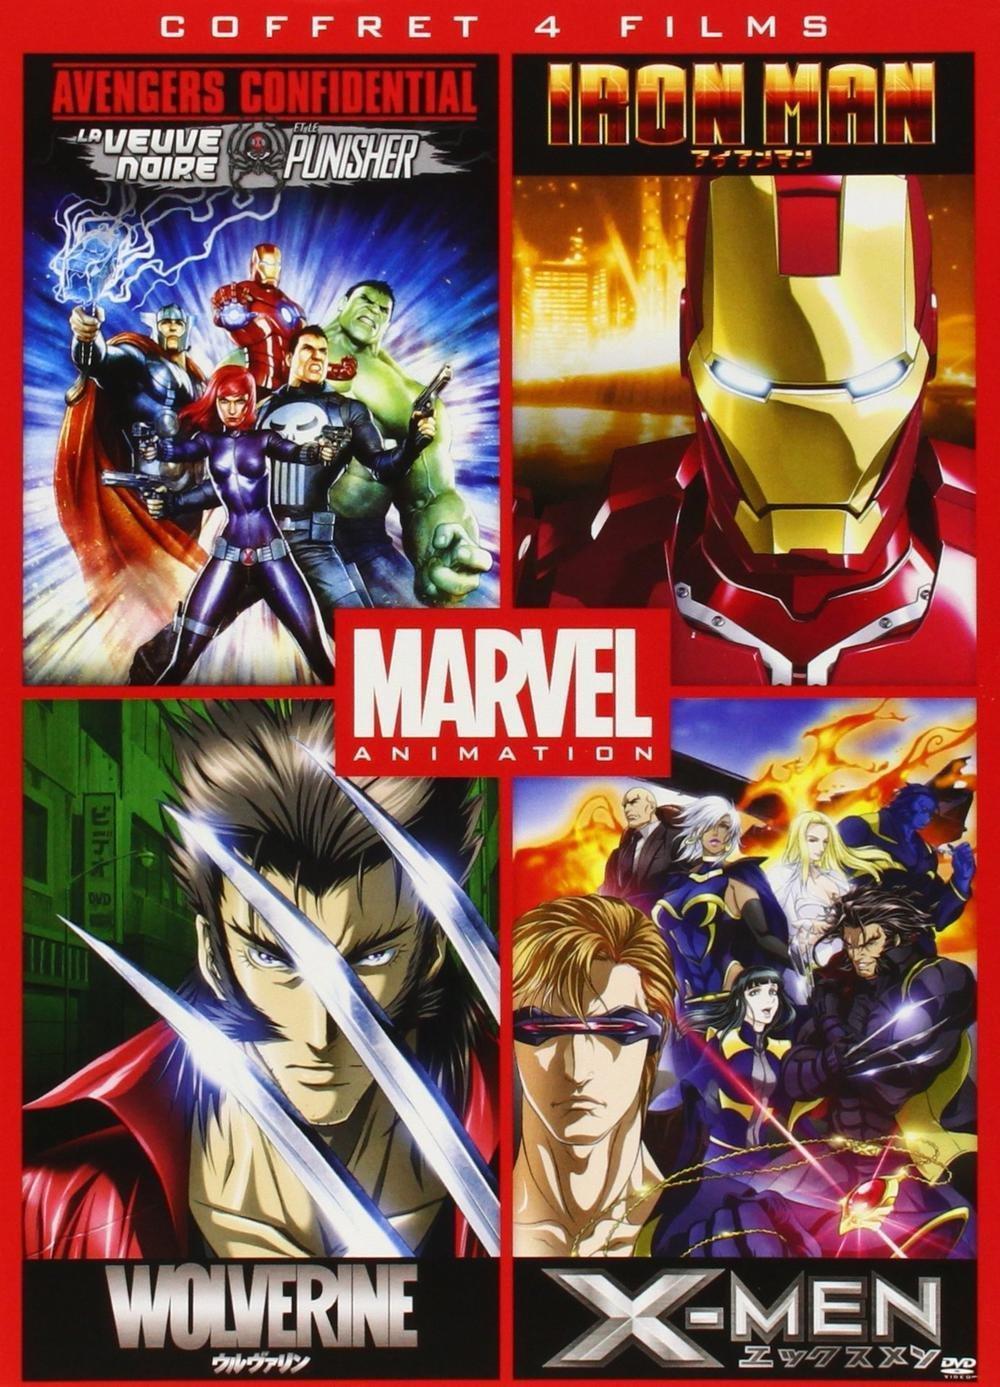 Coffret DVD Marvel Animés : Iron Man + Wolverine + X-Men + Avengers Confidential